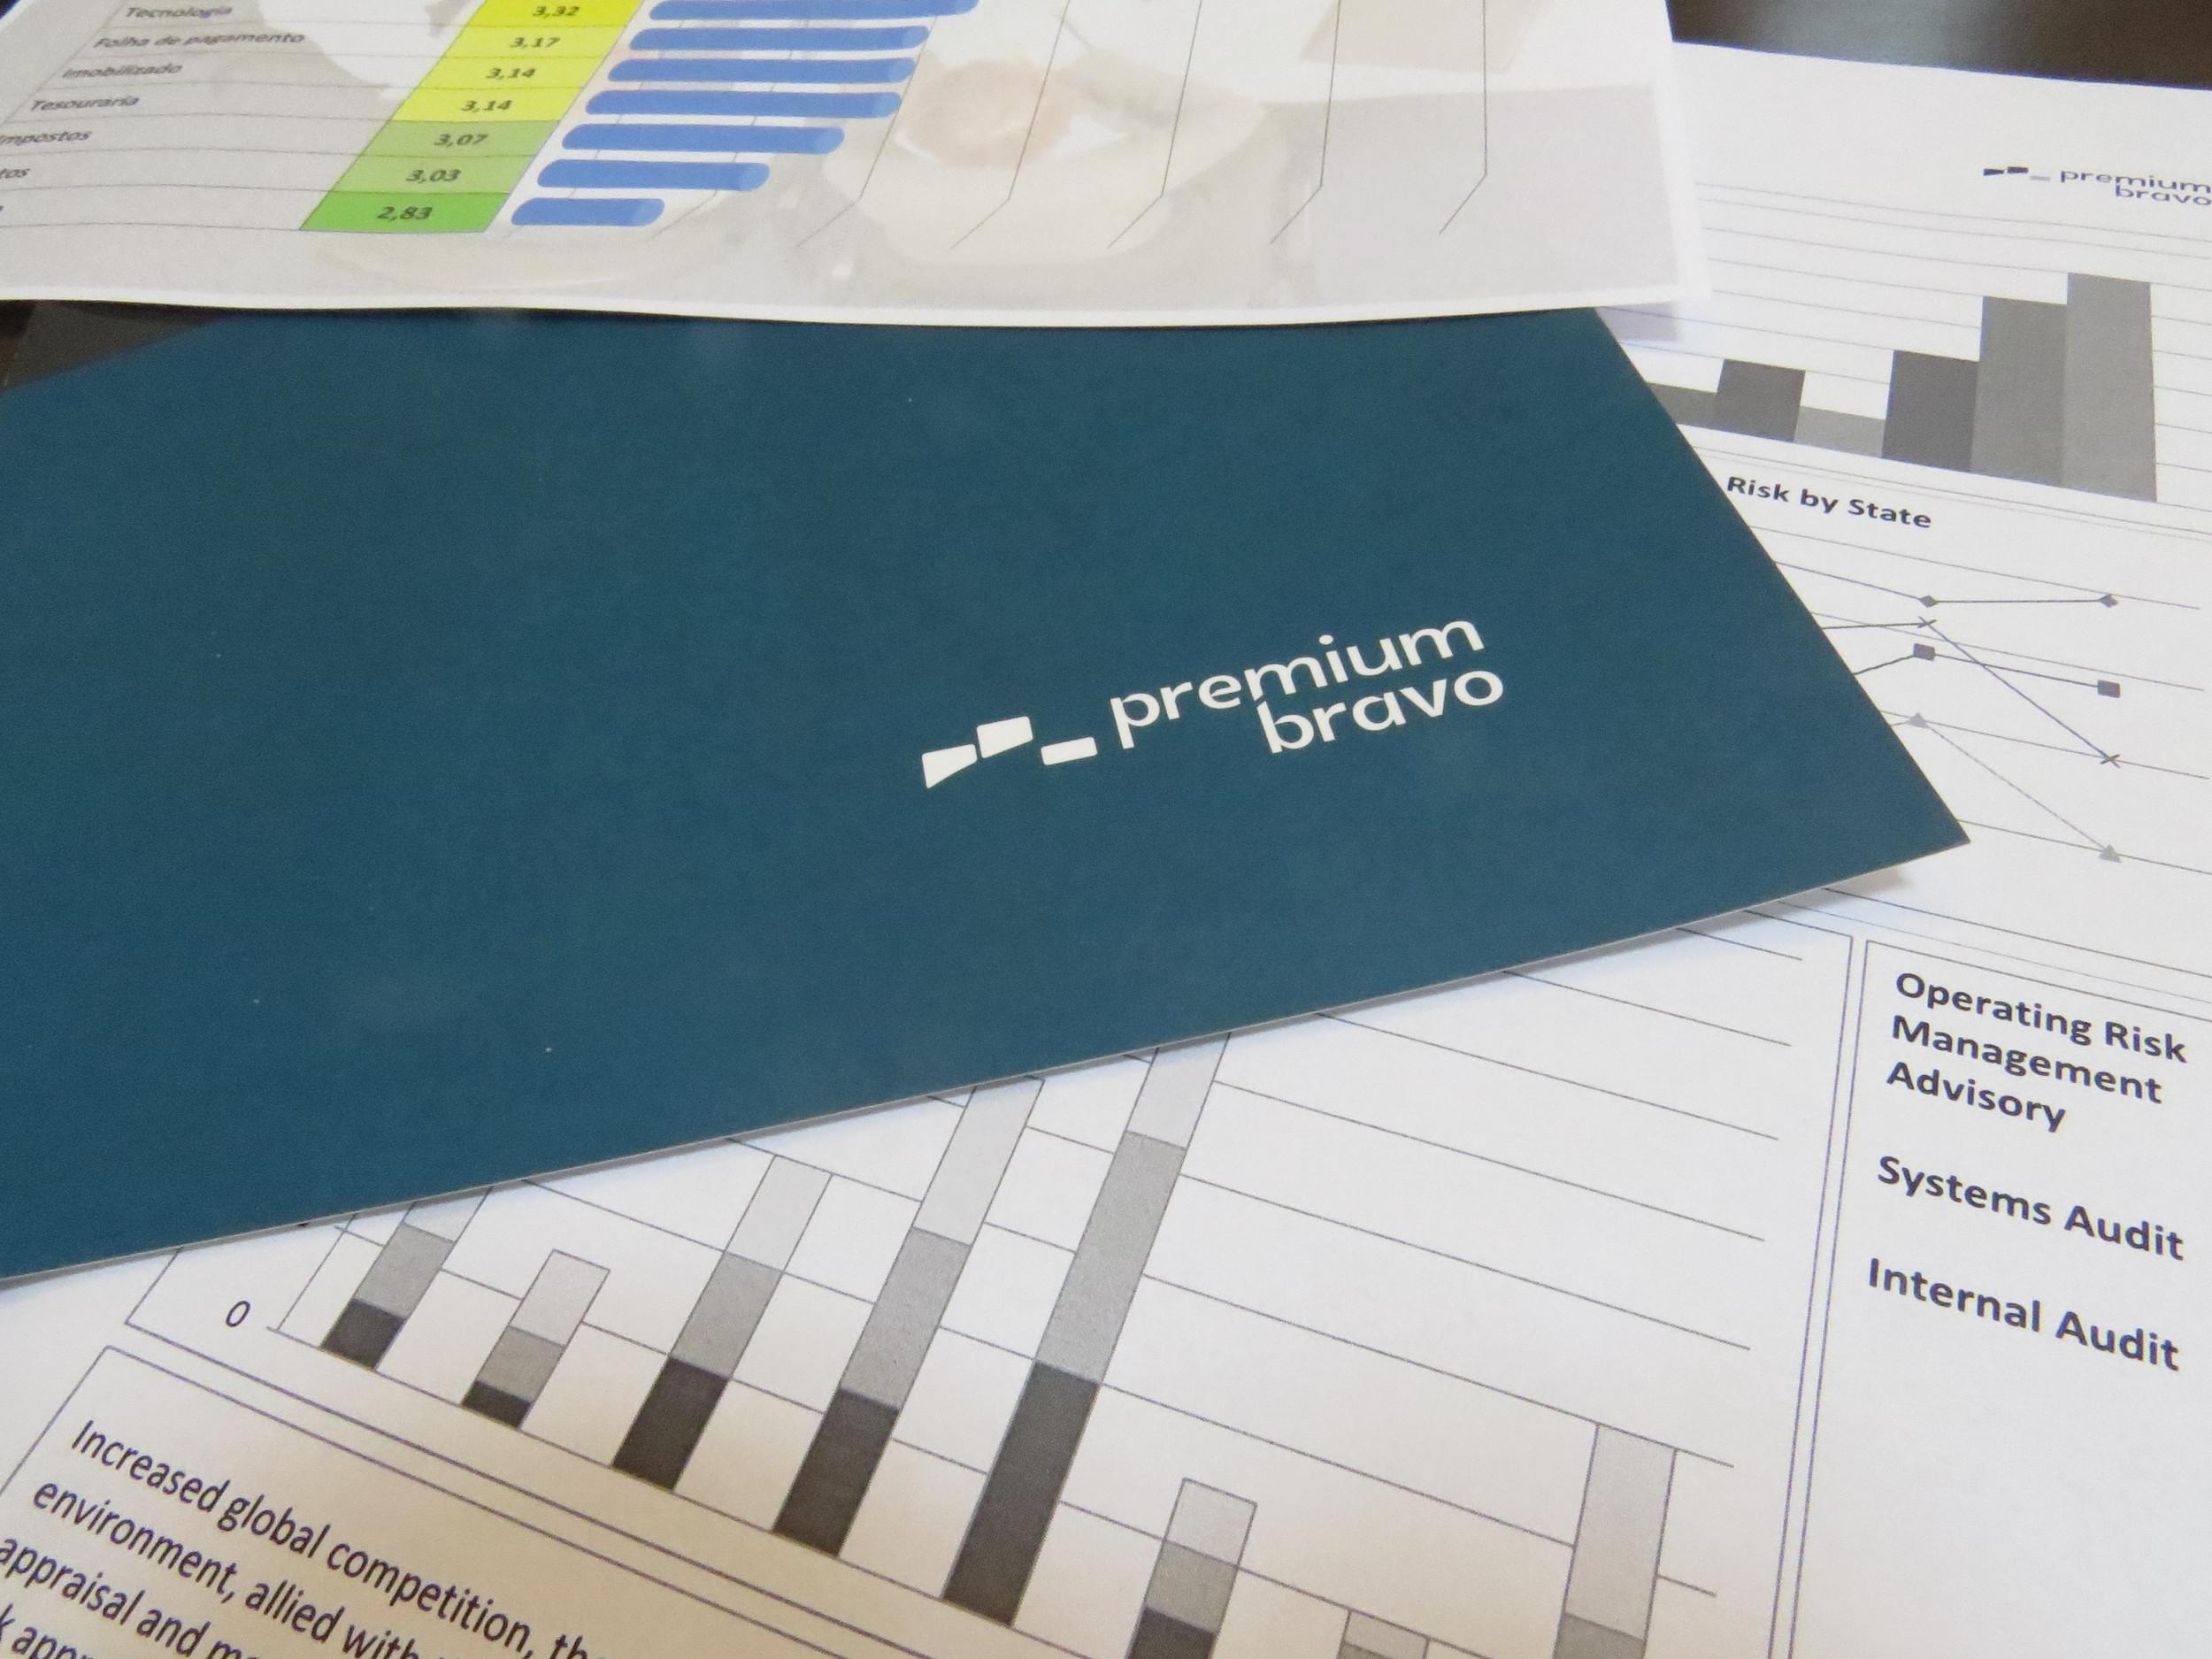 Premiumbravo-escrituracao-contabil-digital-x-escrituracao-contabil-fiscal